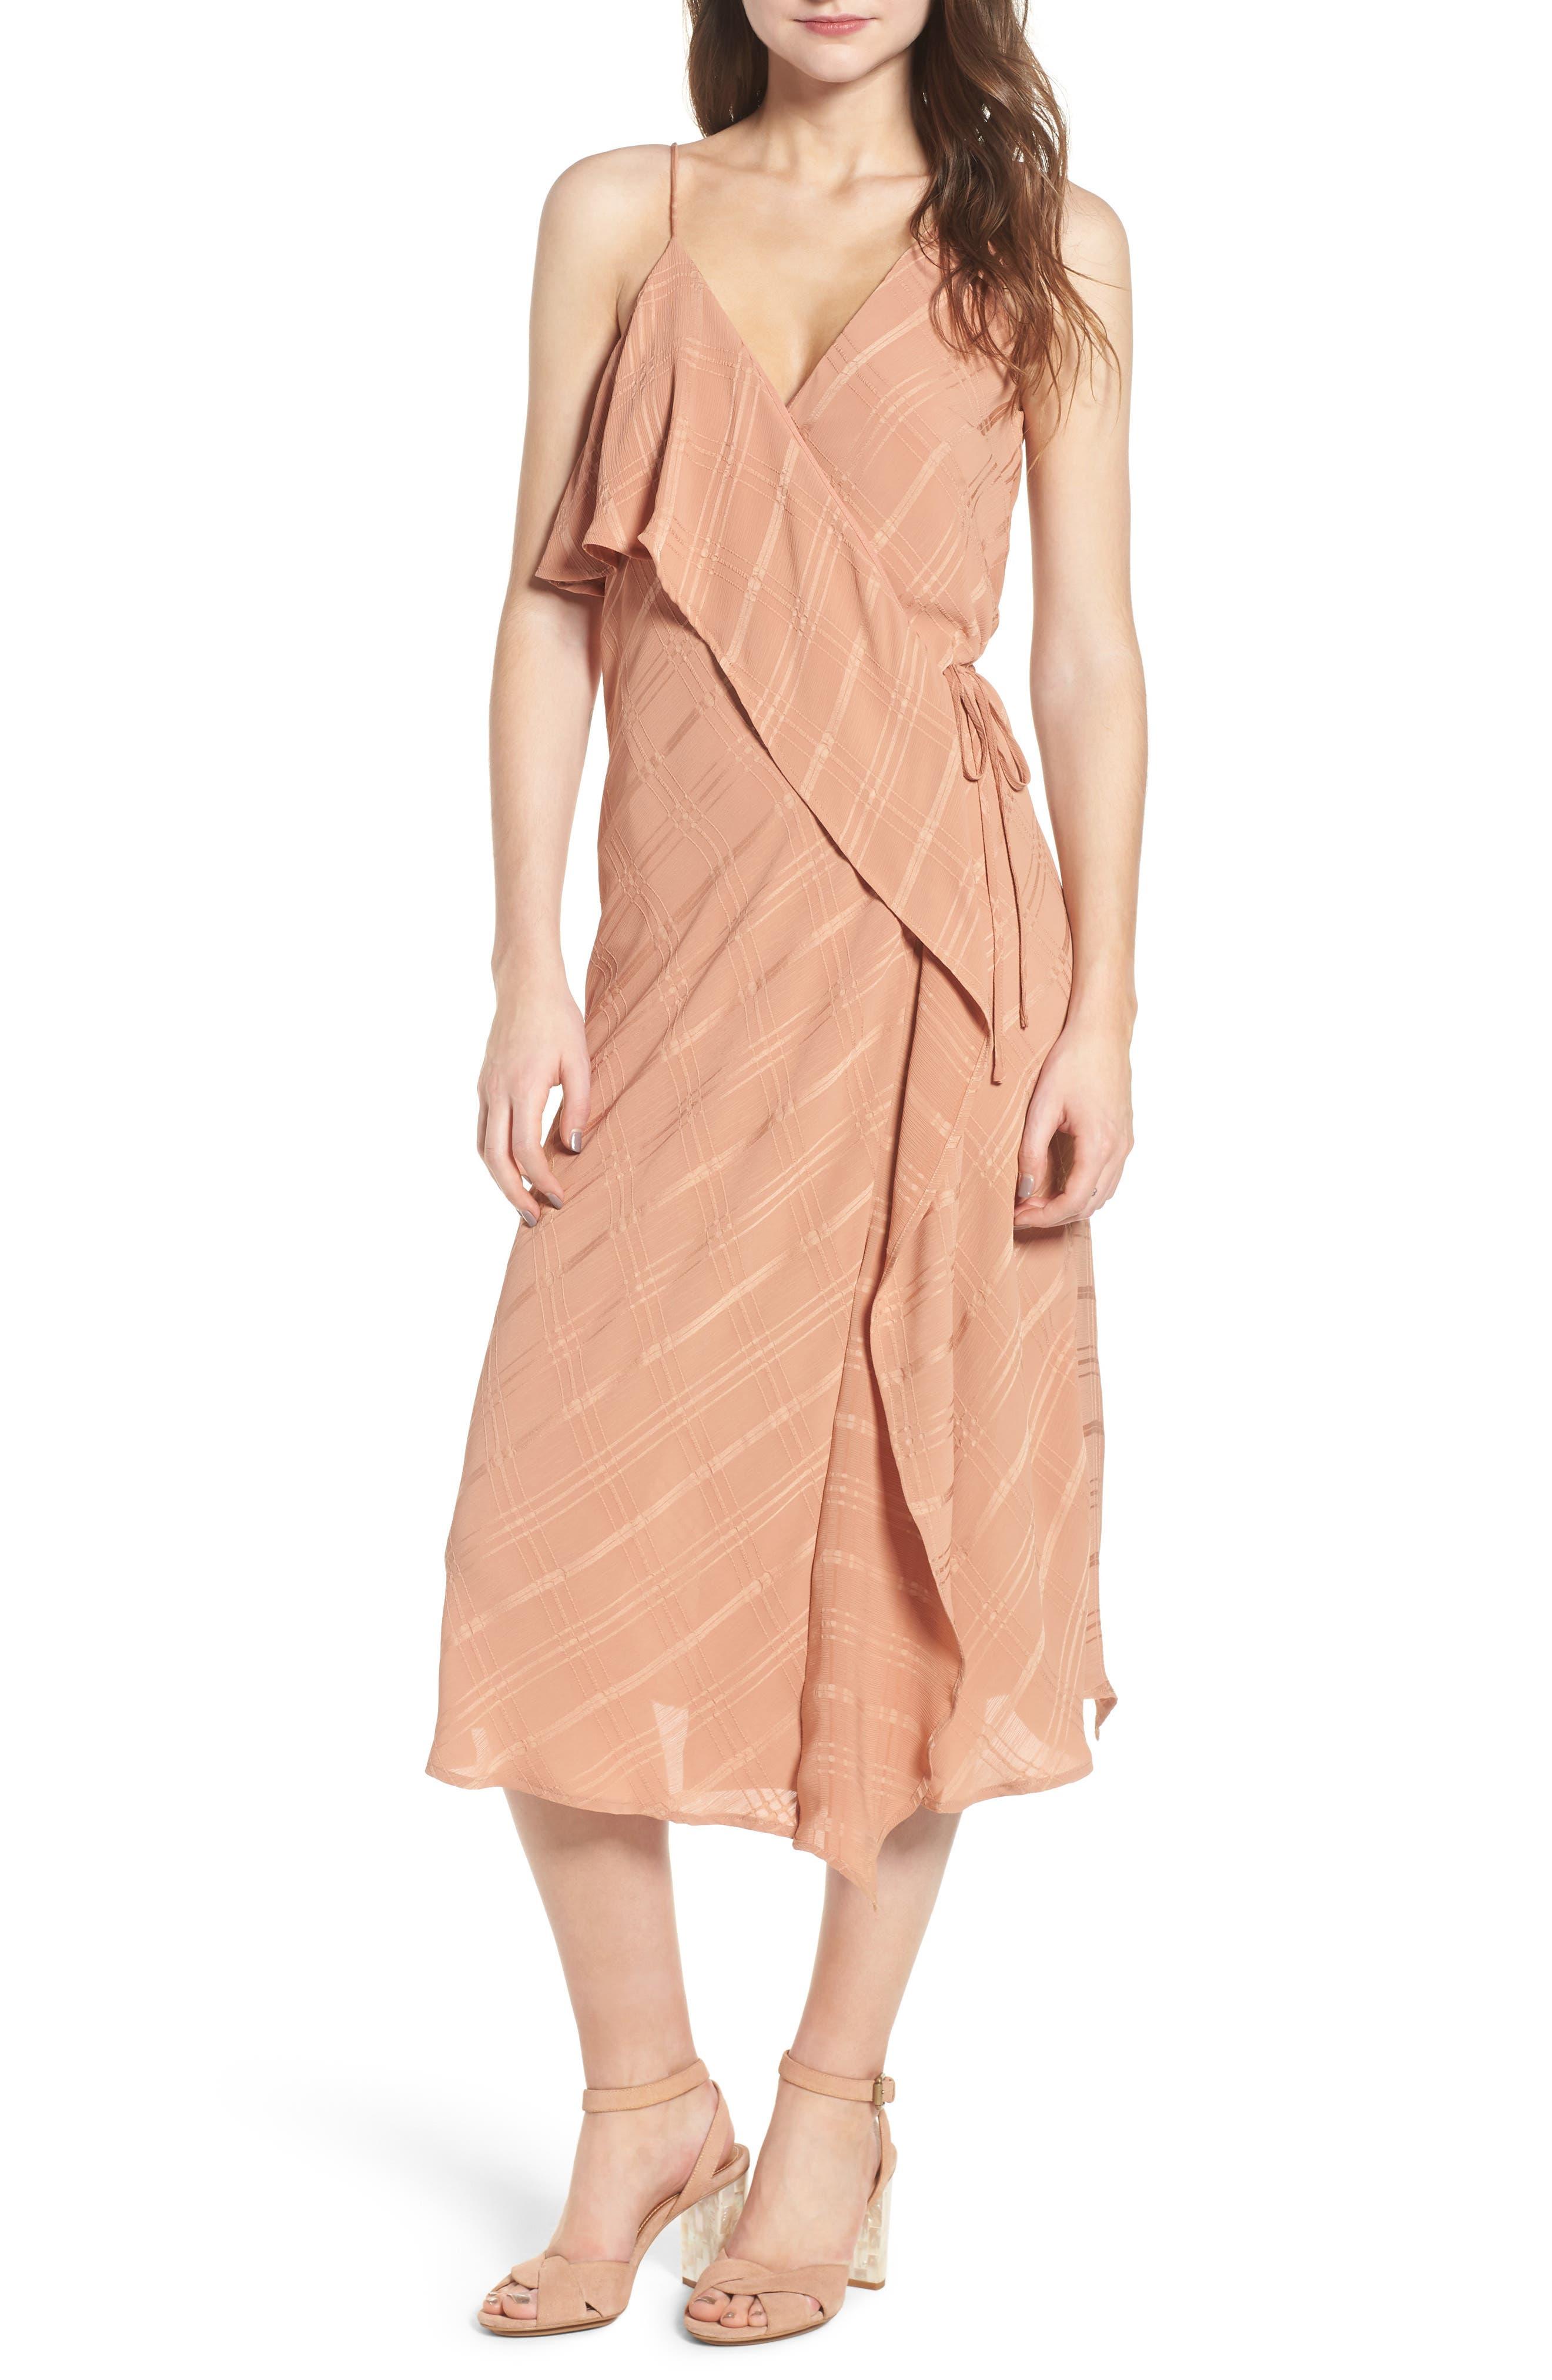 Yoanna Ruffle Trim Wrap Dress,                             Main thumbnail 1, color,                             Terracotta